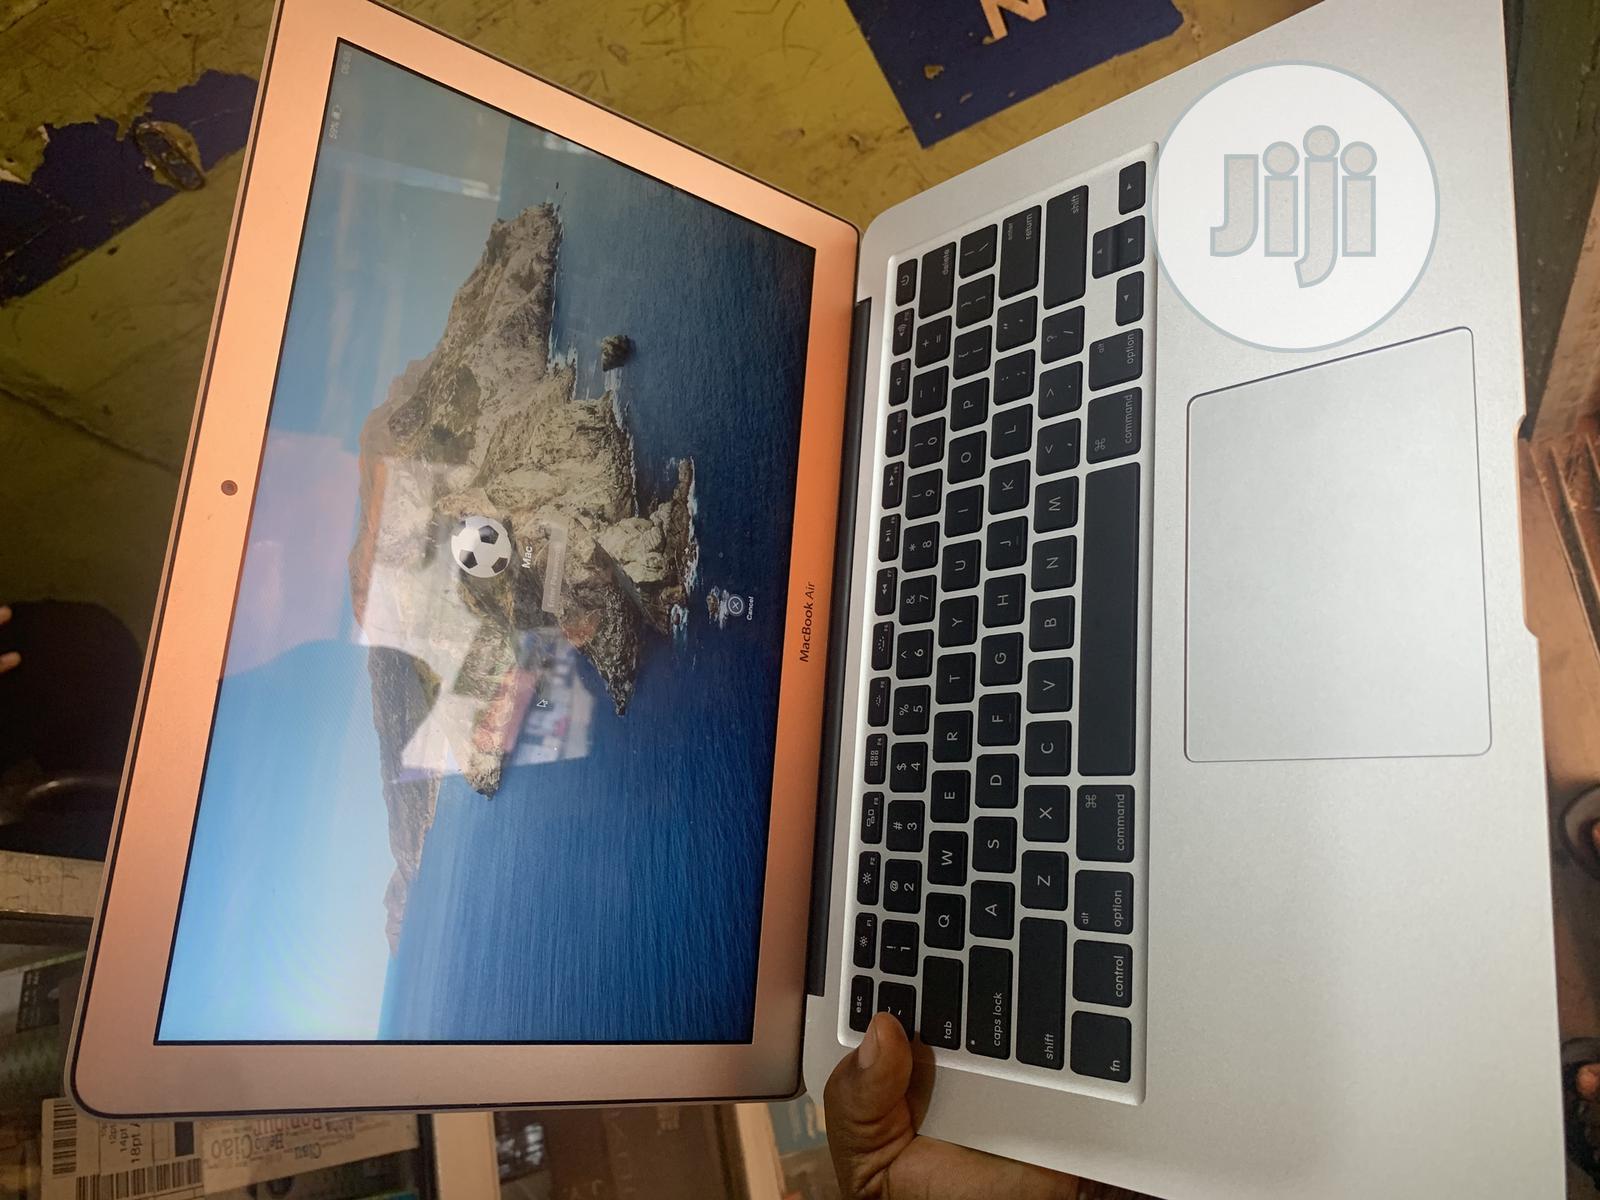 Laptop Apple MacBook Air 8GB Intel Core I5 SSD 256GB | Laptops & Computers for sale in Ikeja, Lagos State, Nigeria